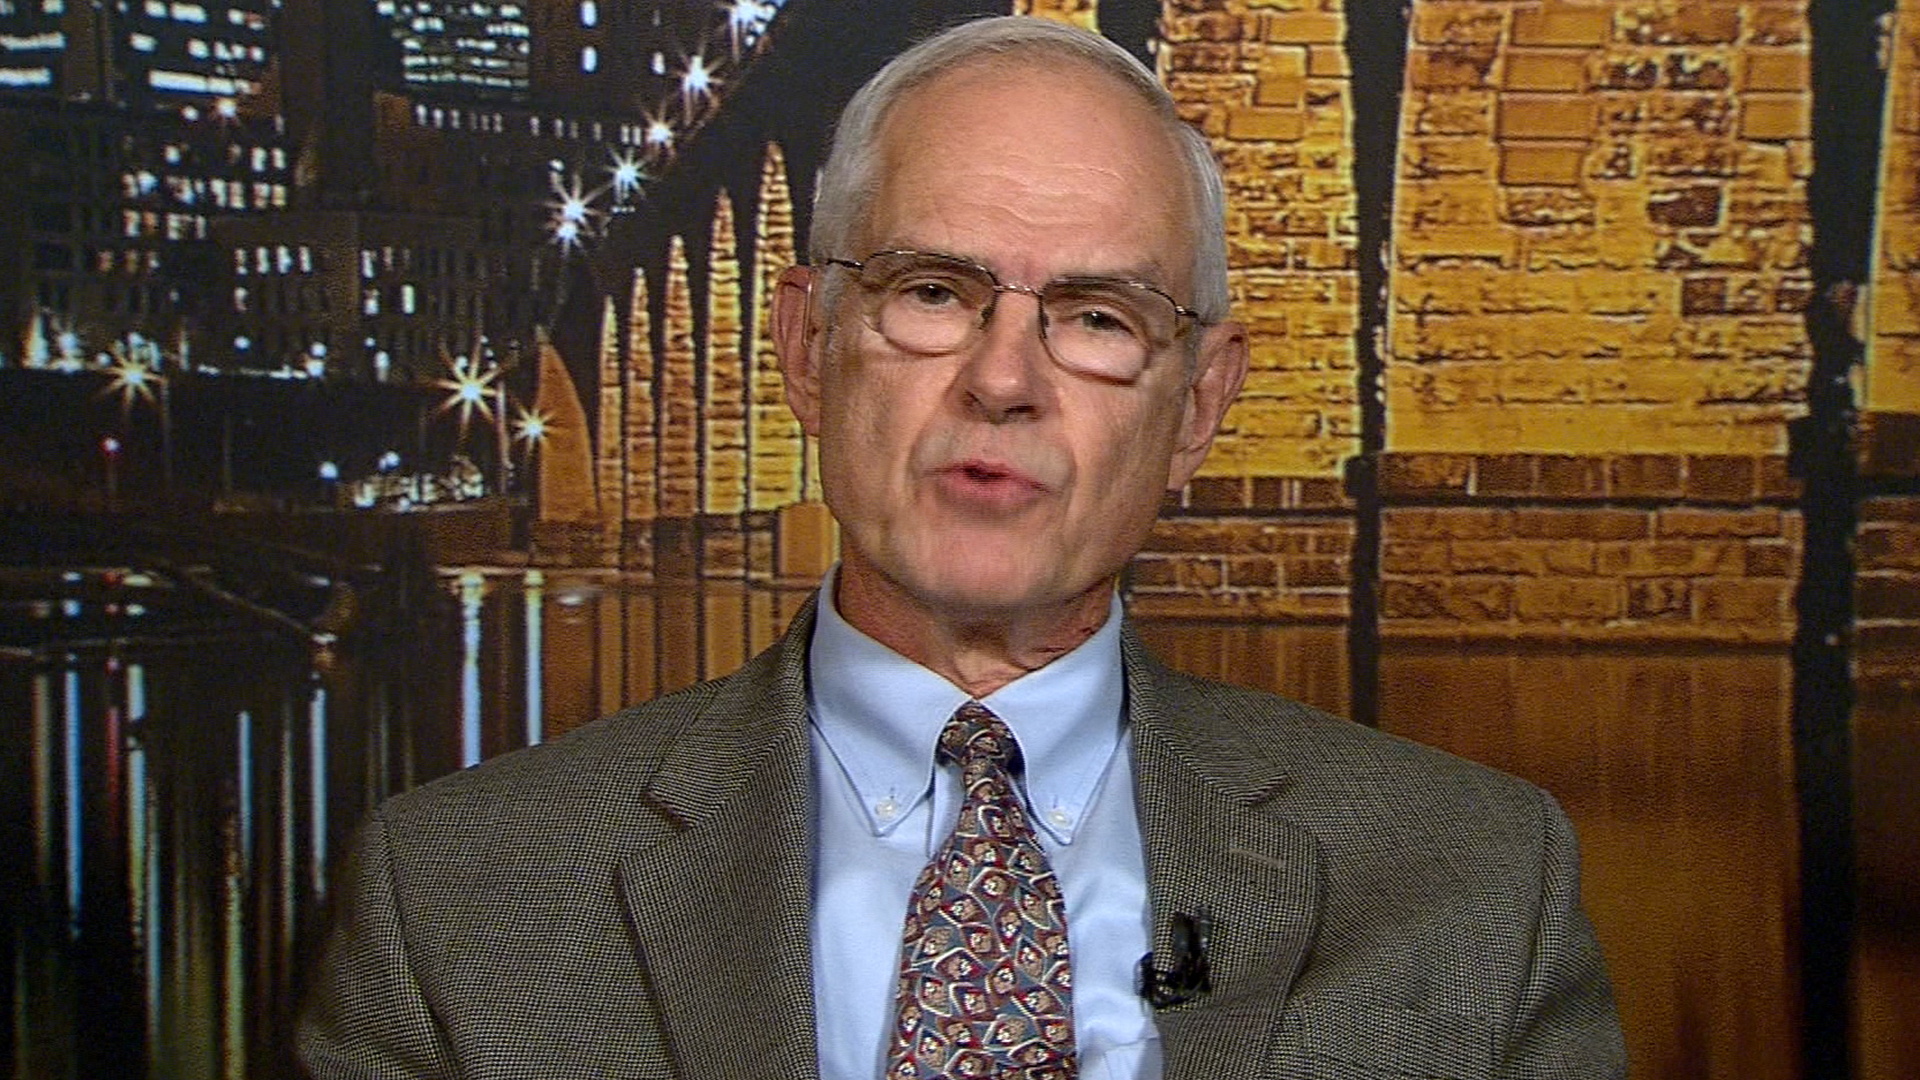 Climate deniers find pushback in Nebraska